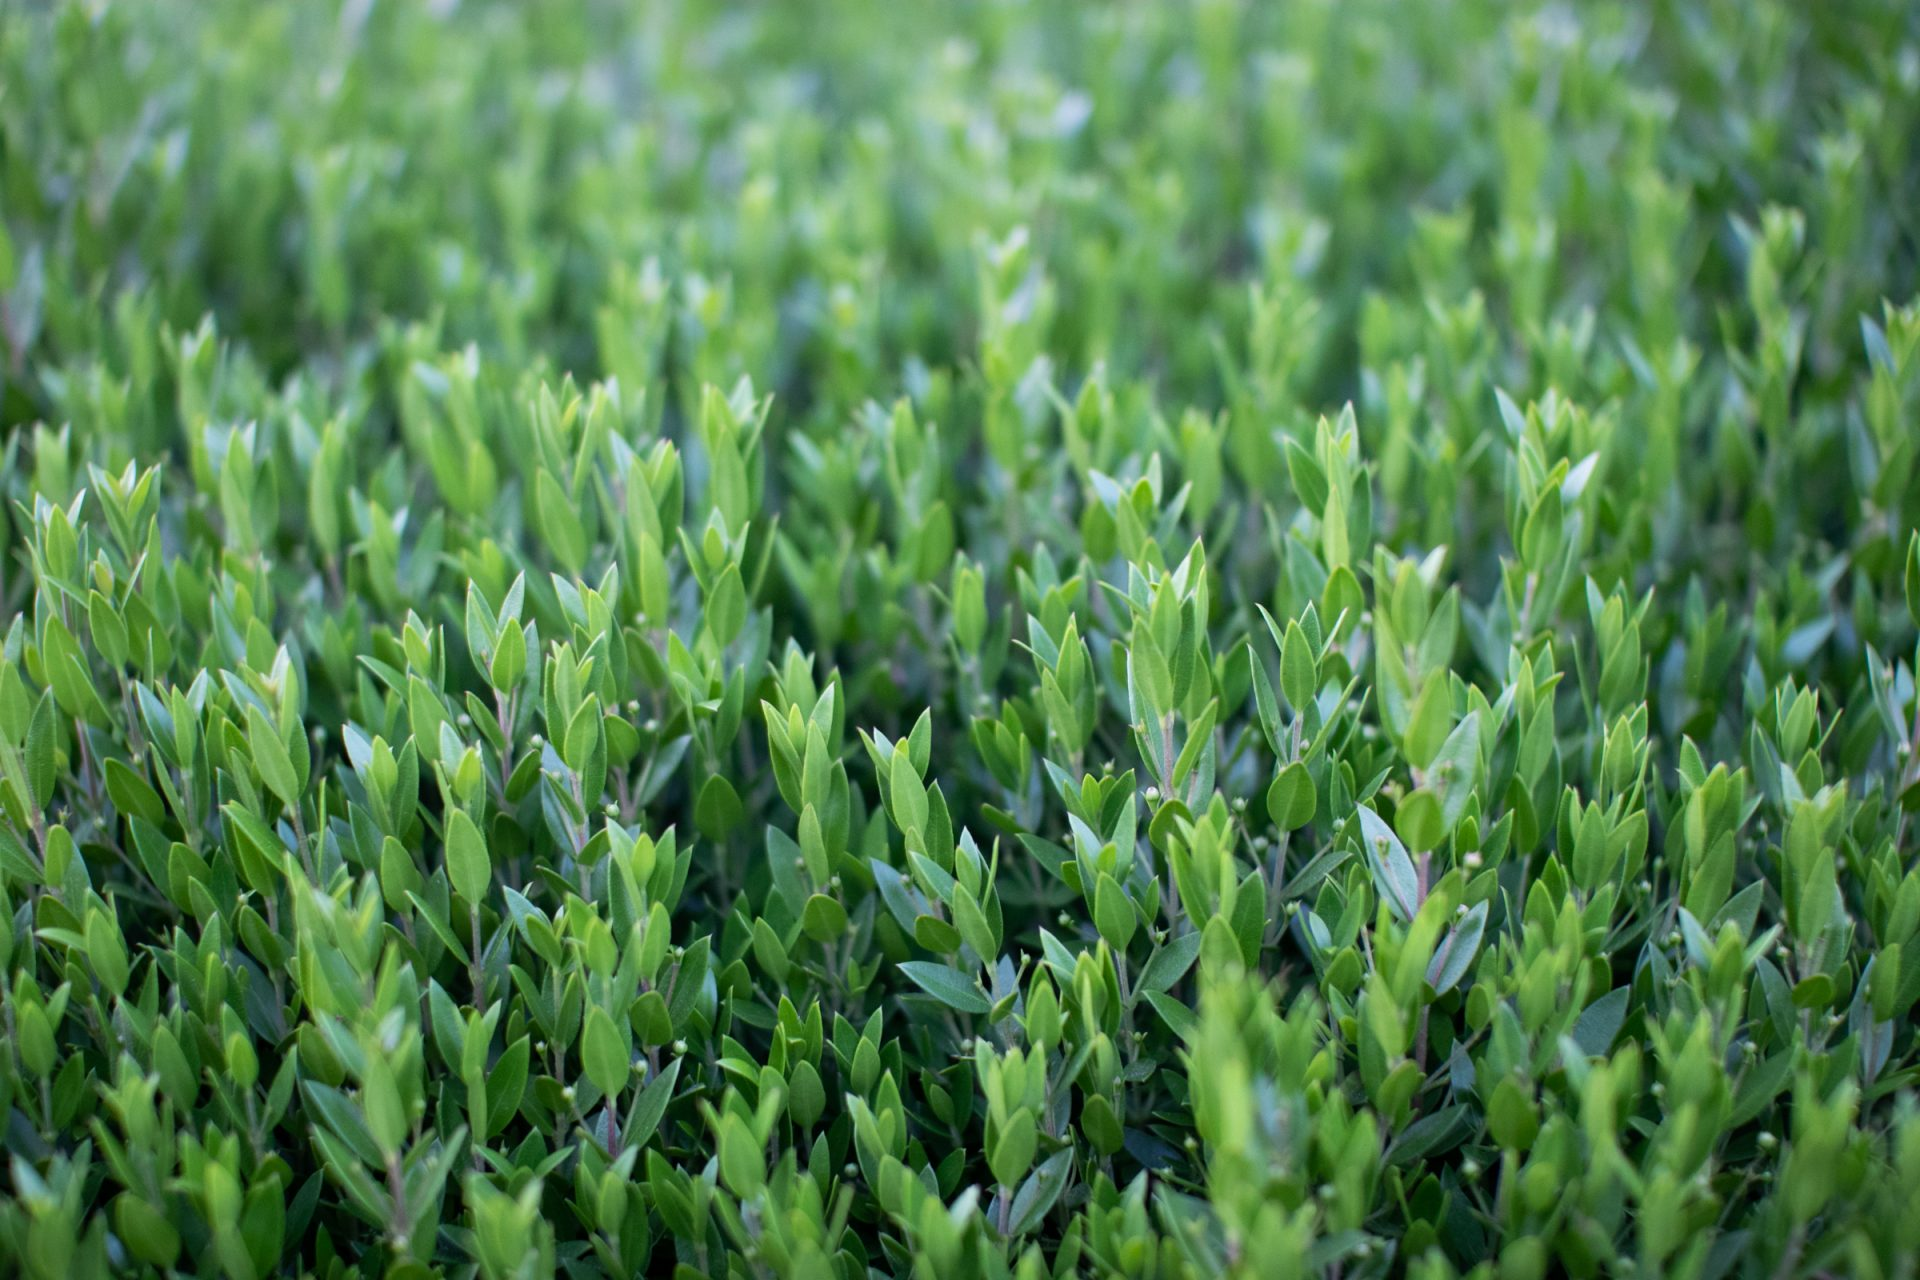 Small Light Green Plants